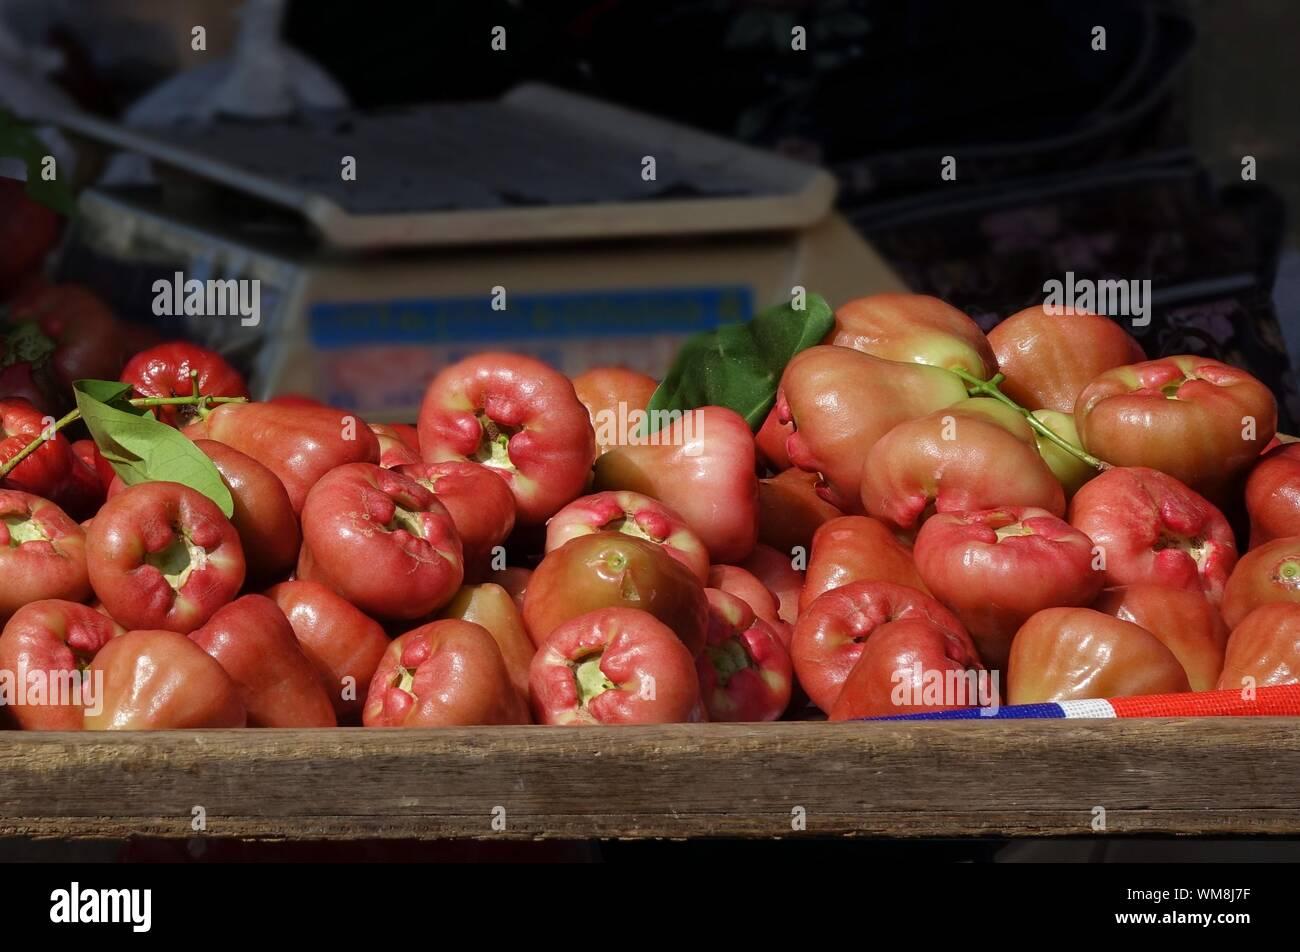 Wax apples or bell fruits (Syzygium samarangense) are a